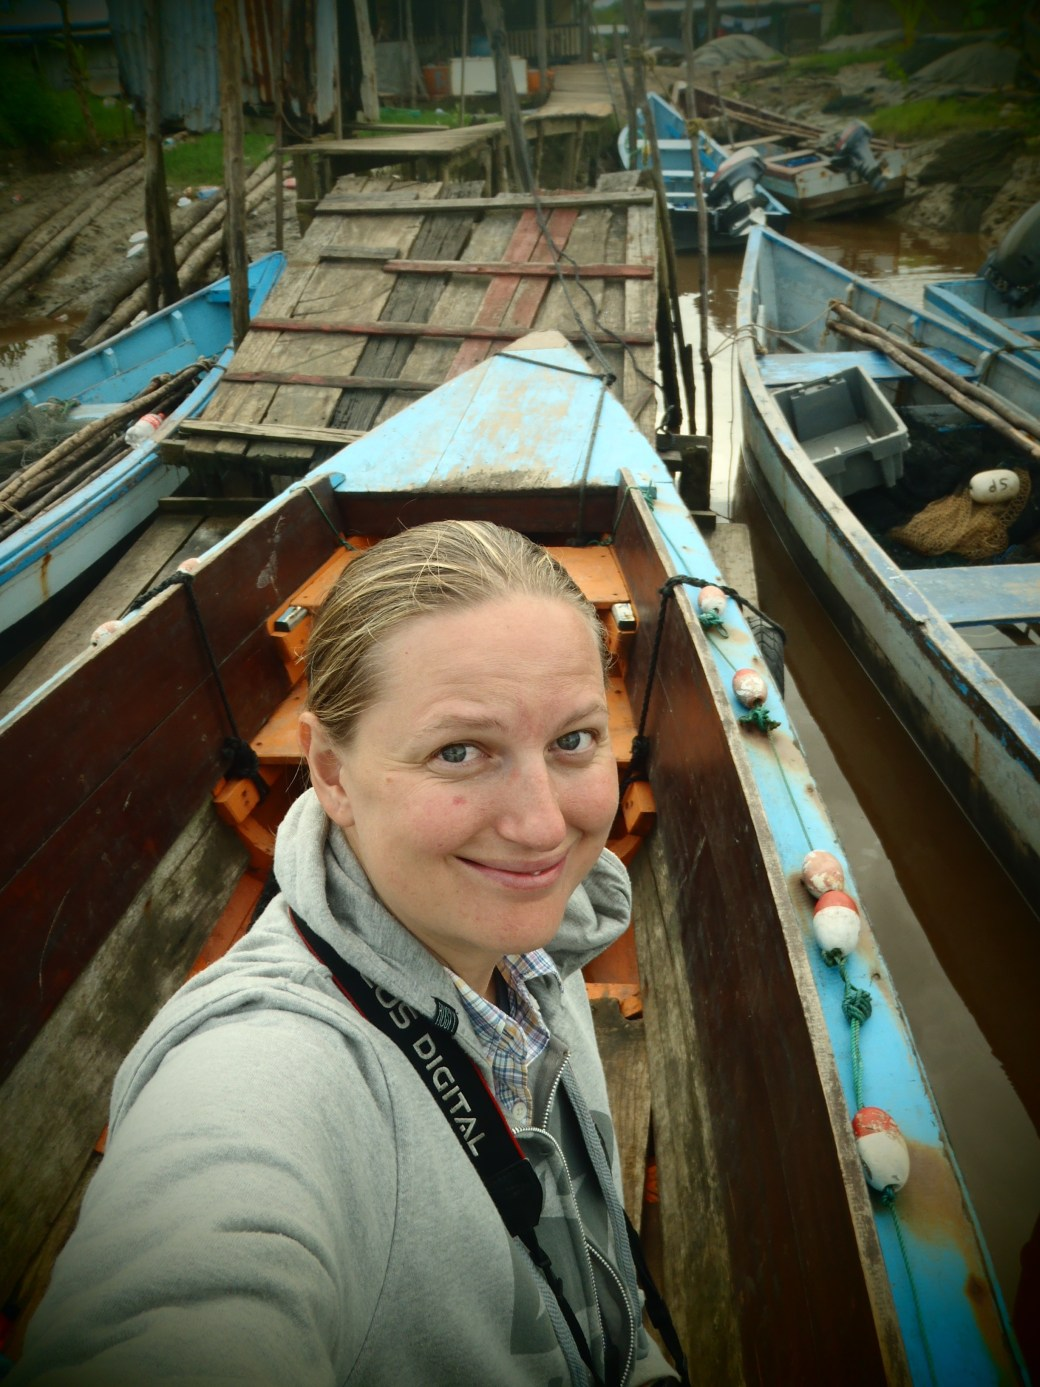 Me on the boat; Paramibo, Suriname; 2013